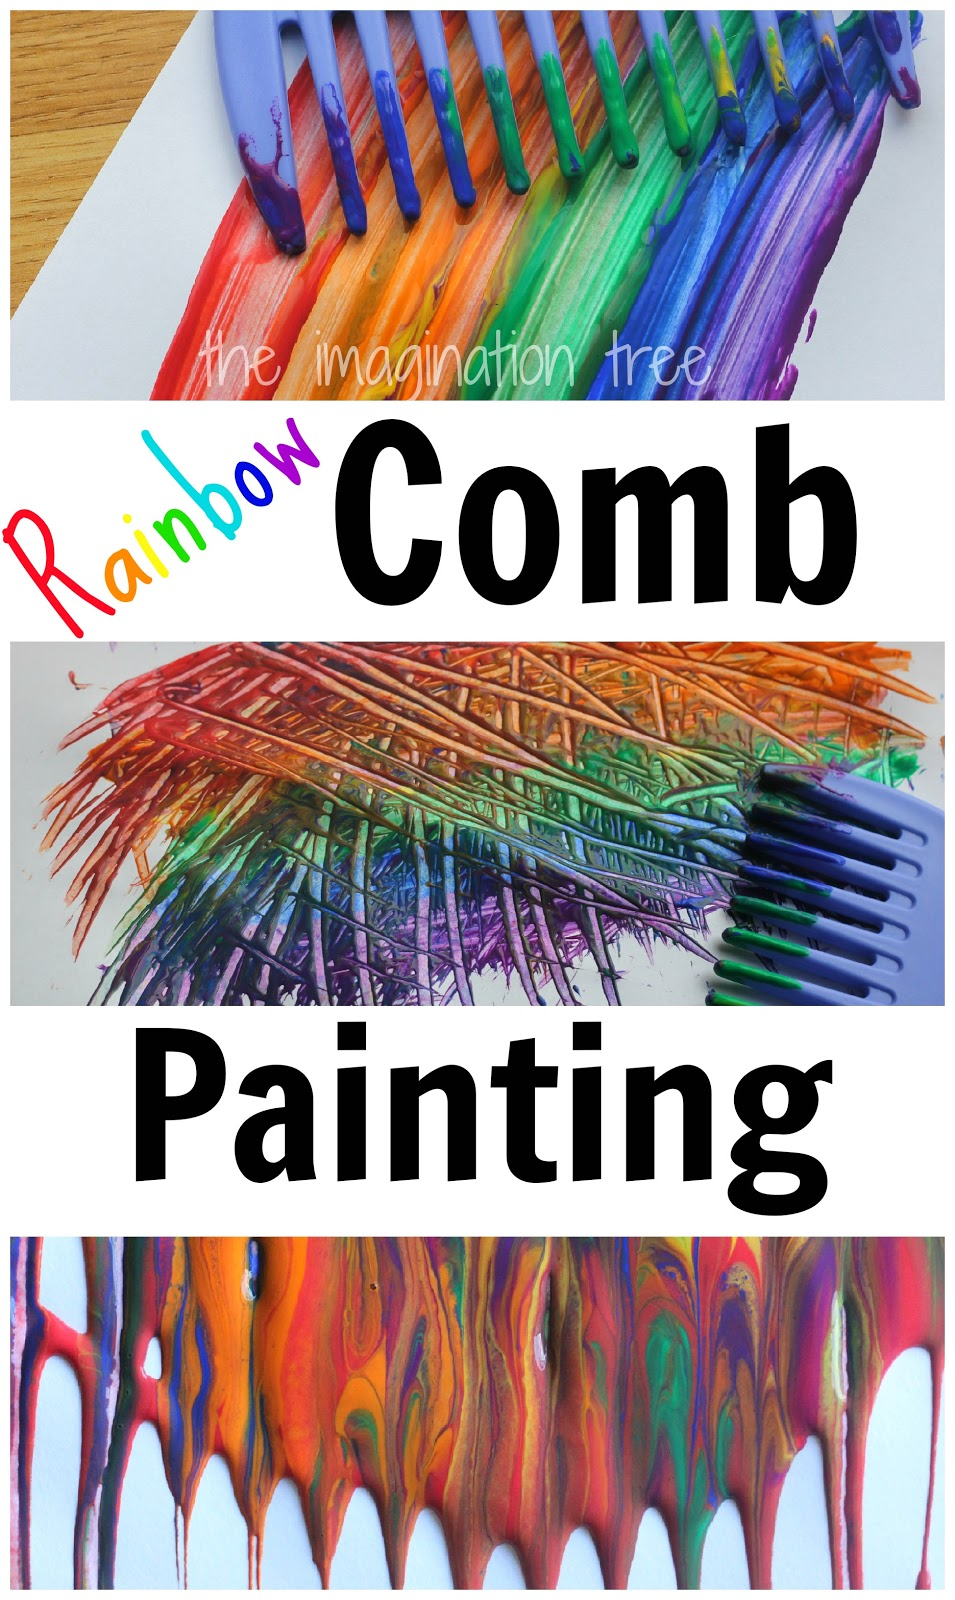 Rainbow Comb Paintings The Imagination Tree